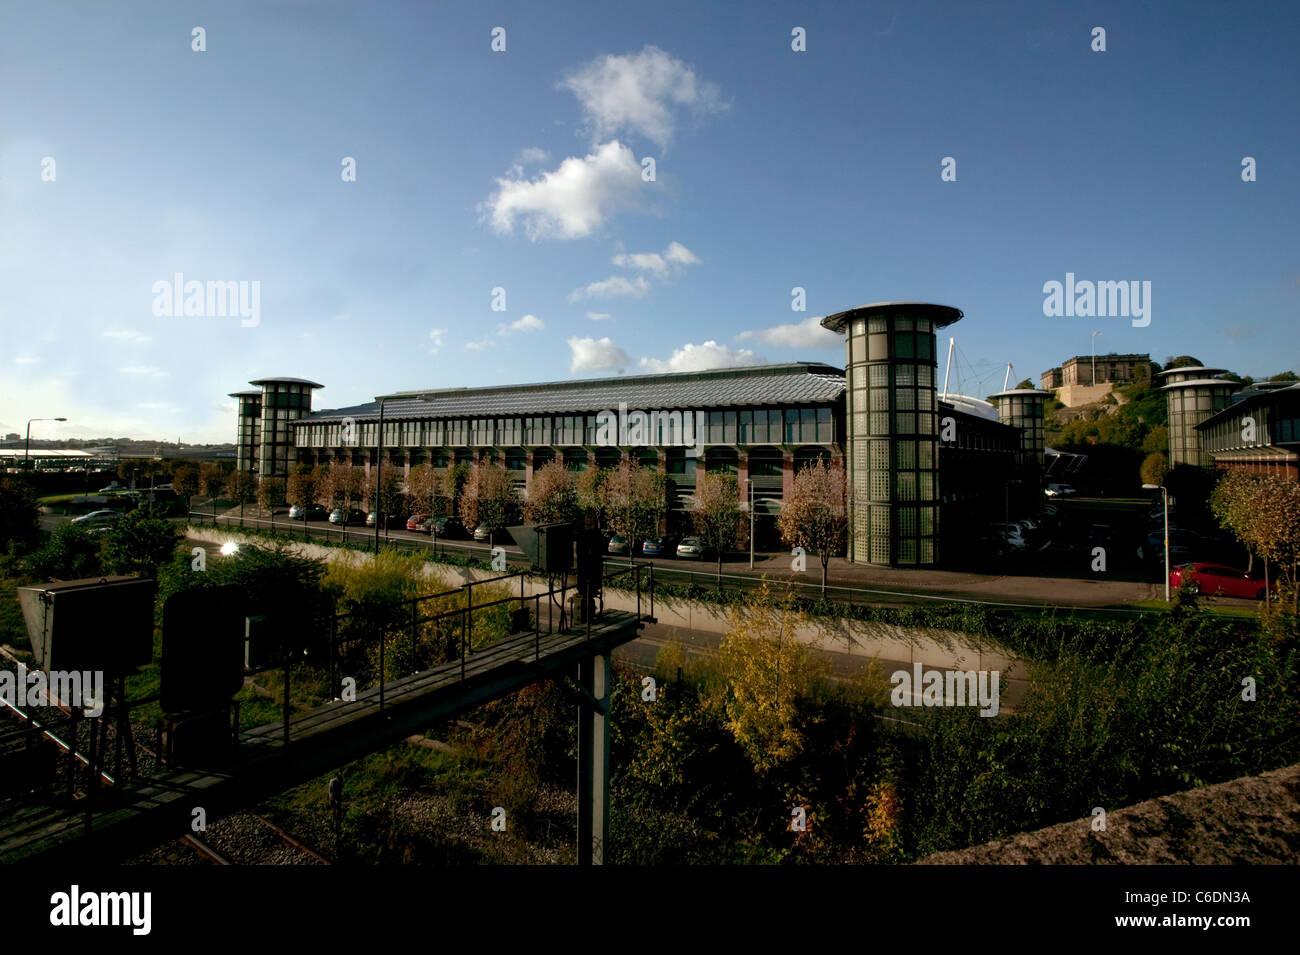 Inland Revenue building Nottingham - Stock Image